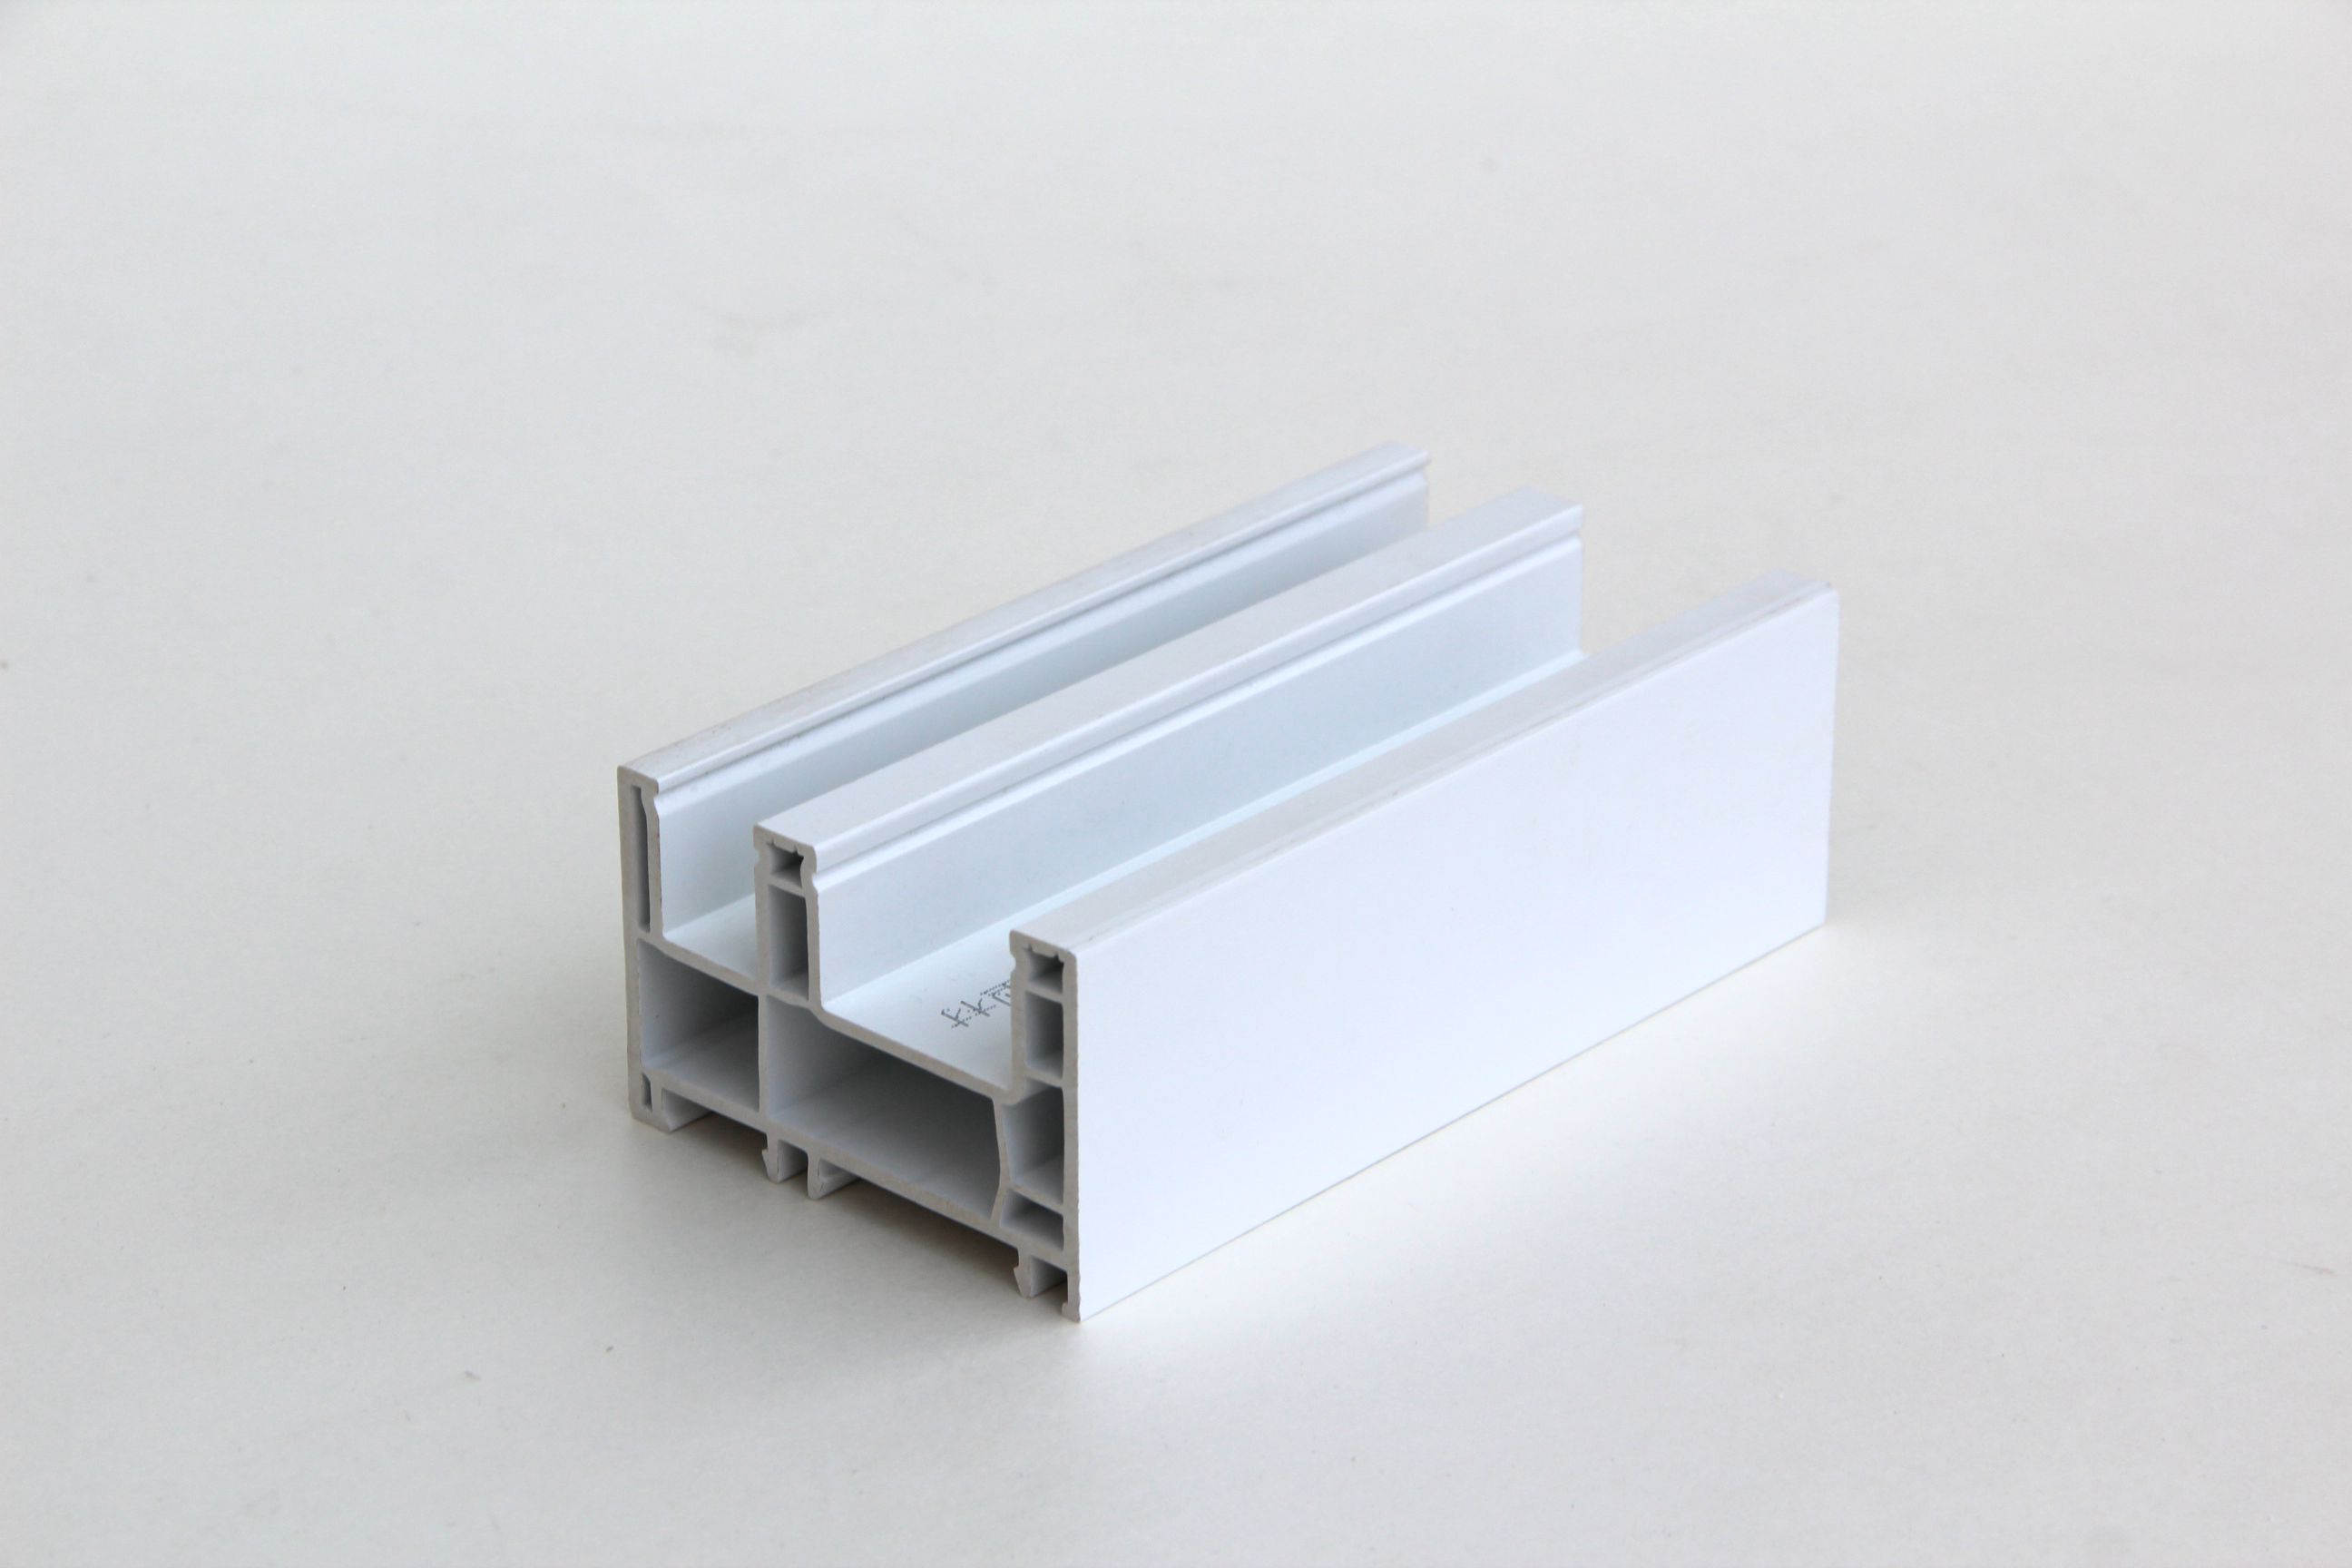 80mm White Pvc Profile For Plastic Window And Door Plastic Building